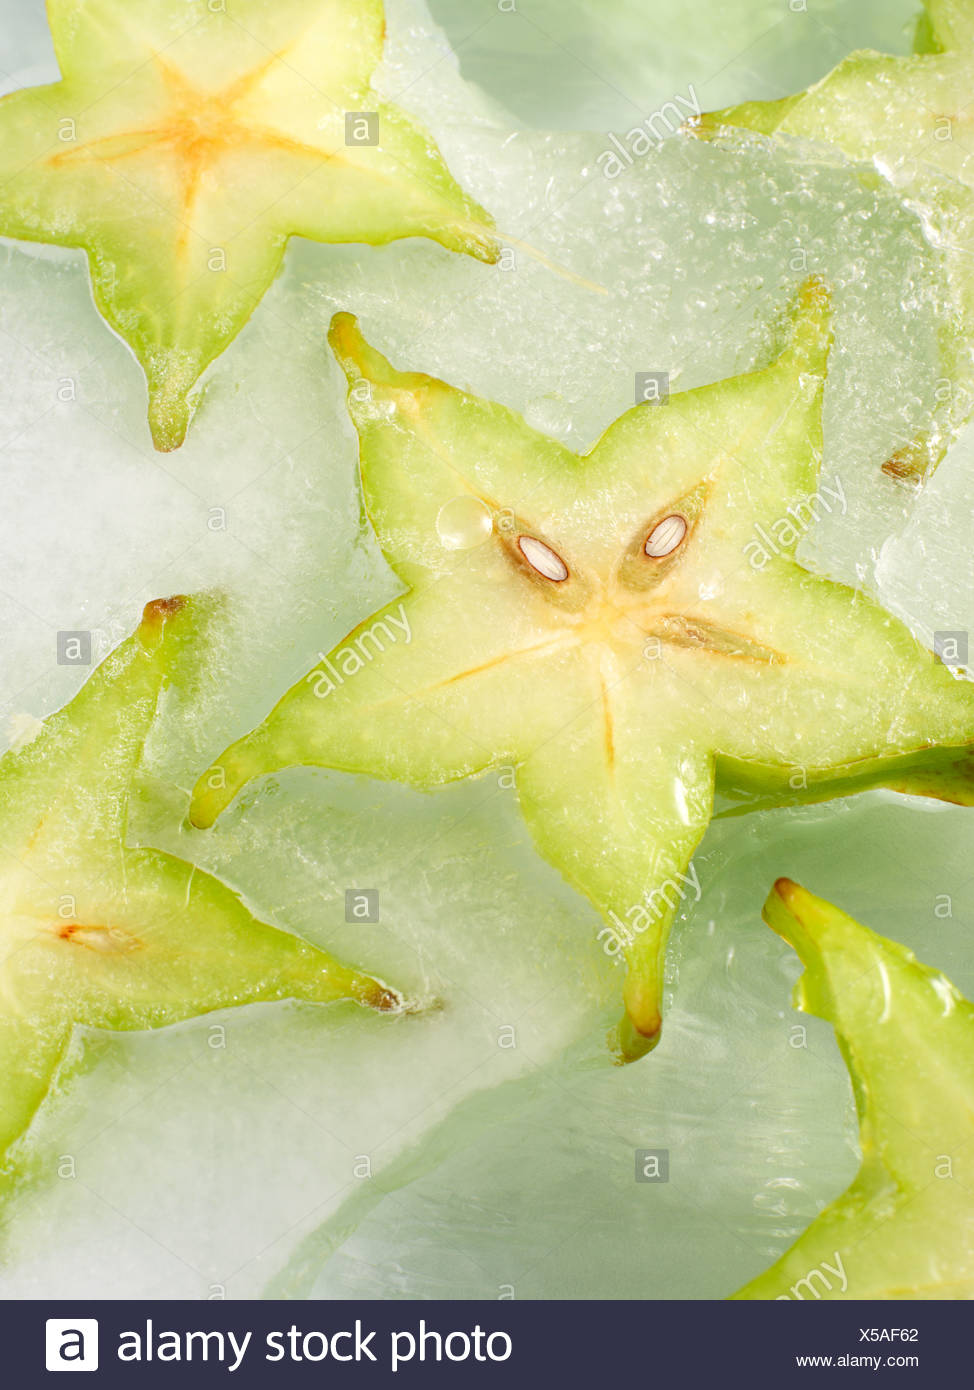 Frozen slices of star fruit - Stock Image